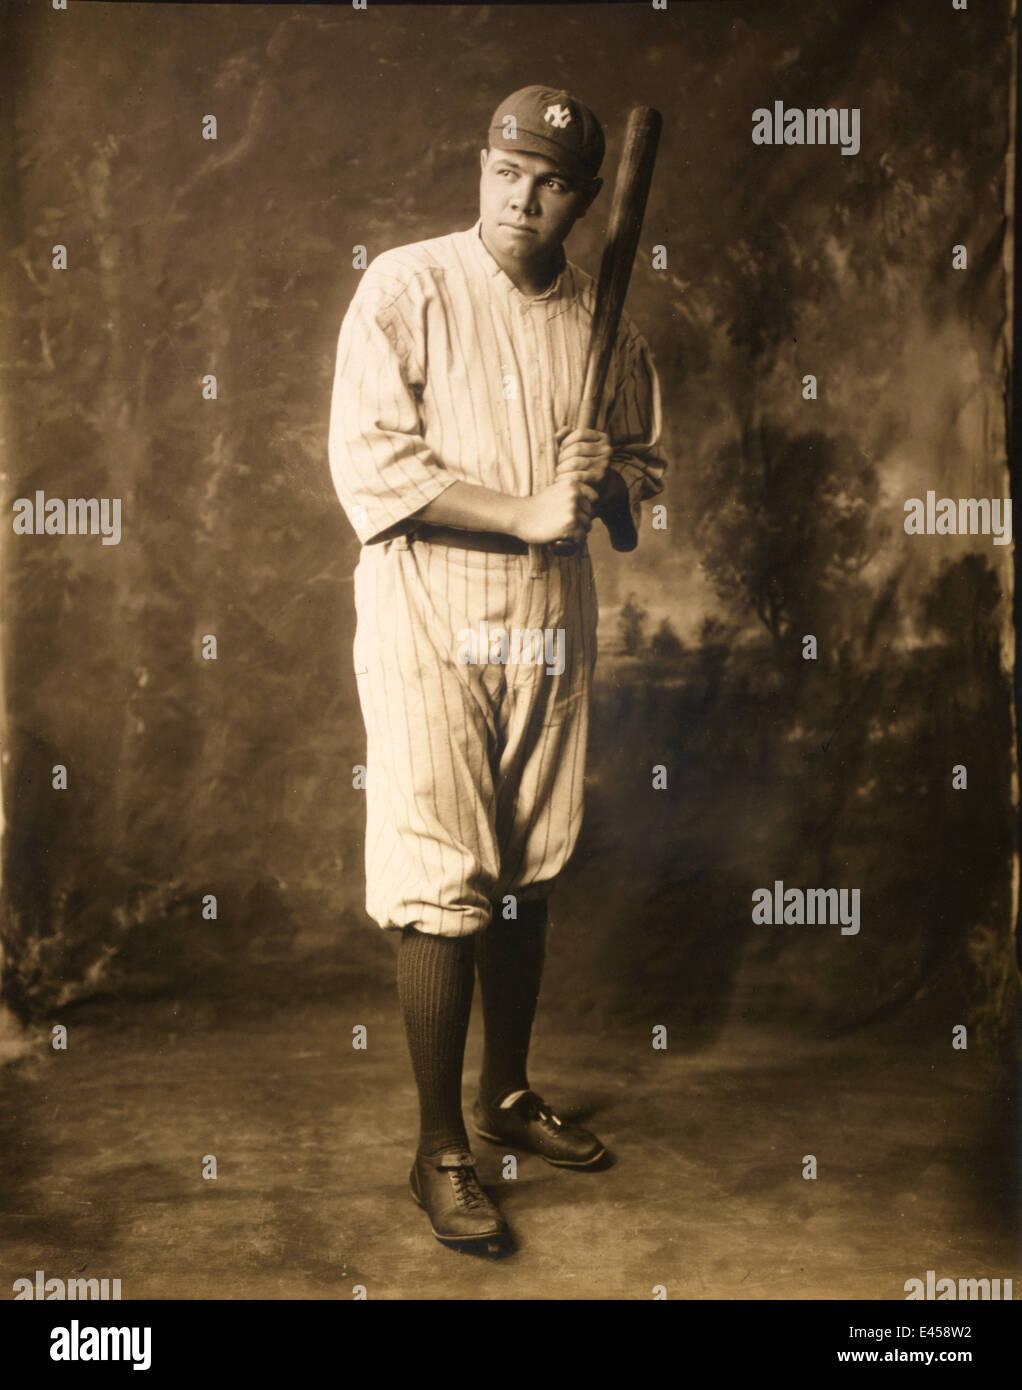 Babe Ruth, American baseball player Babe Ruth - Stock Image